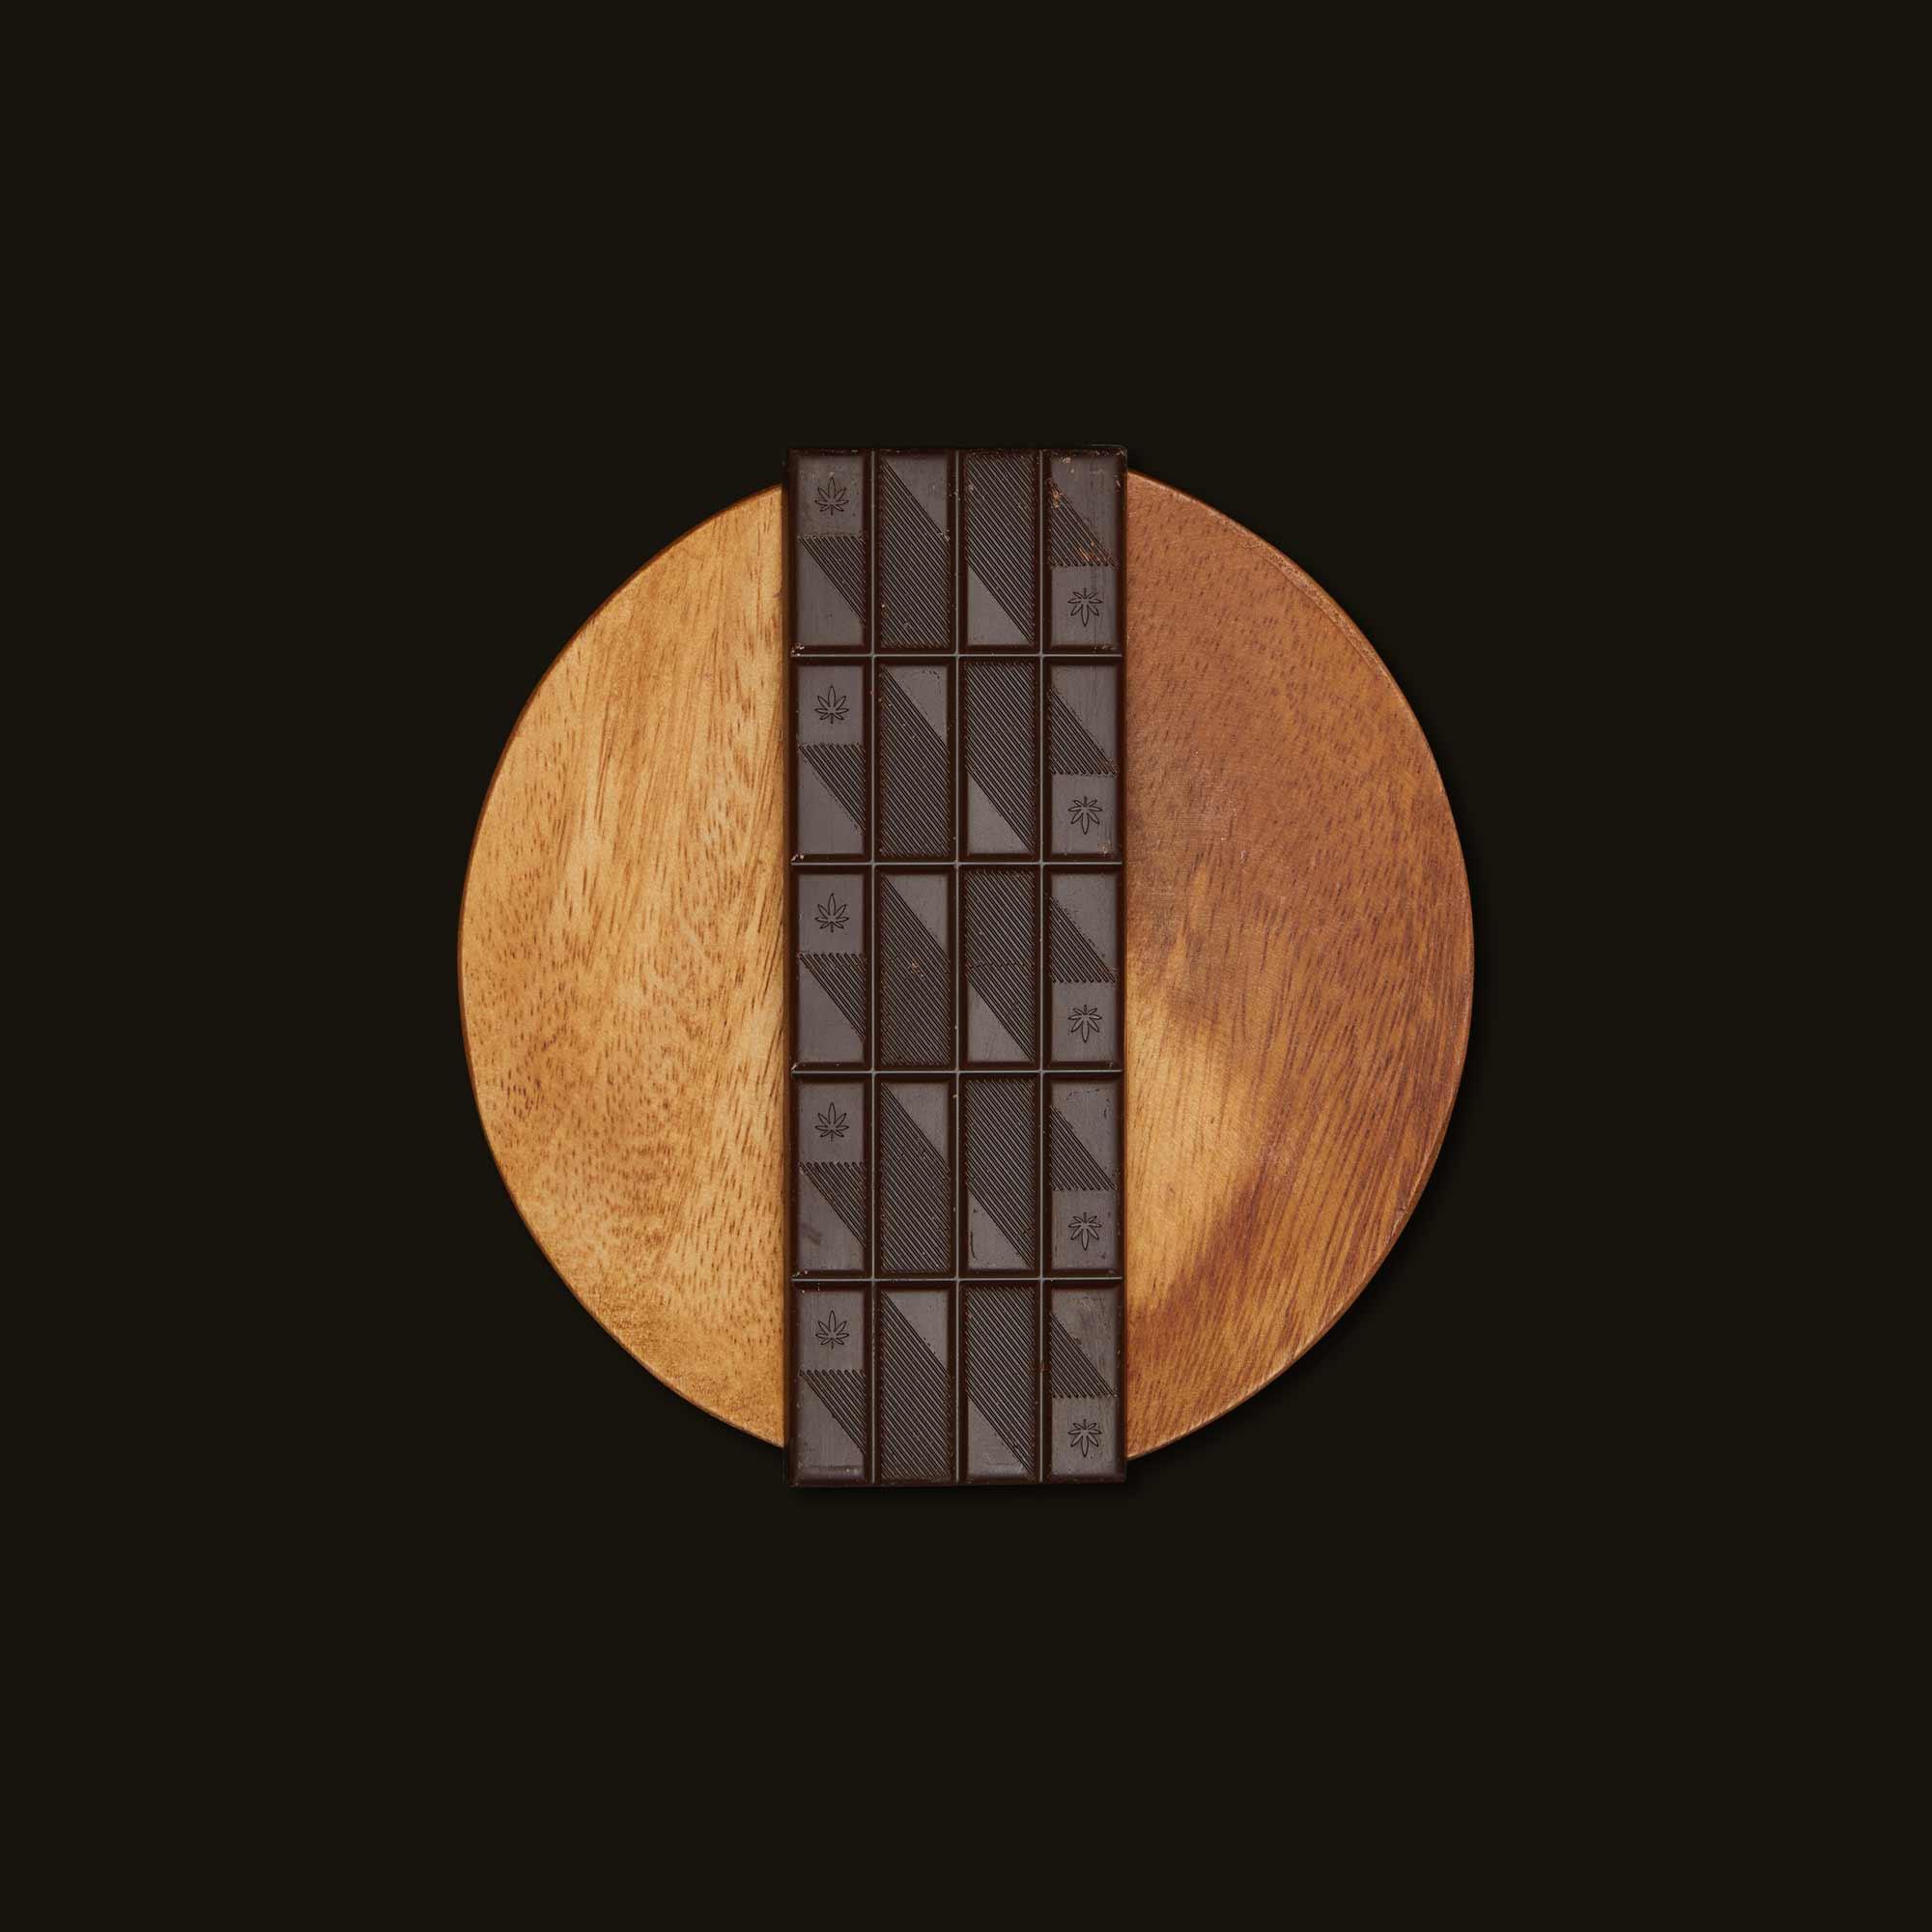 Dark Chocolate Kiva Bar by Kiva Confections